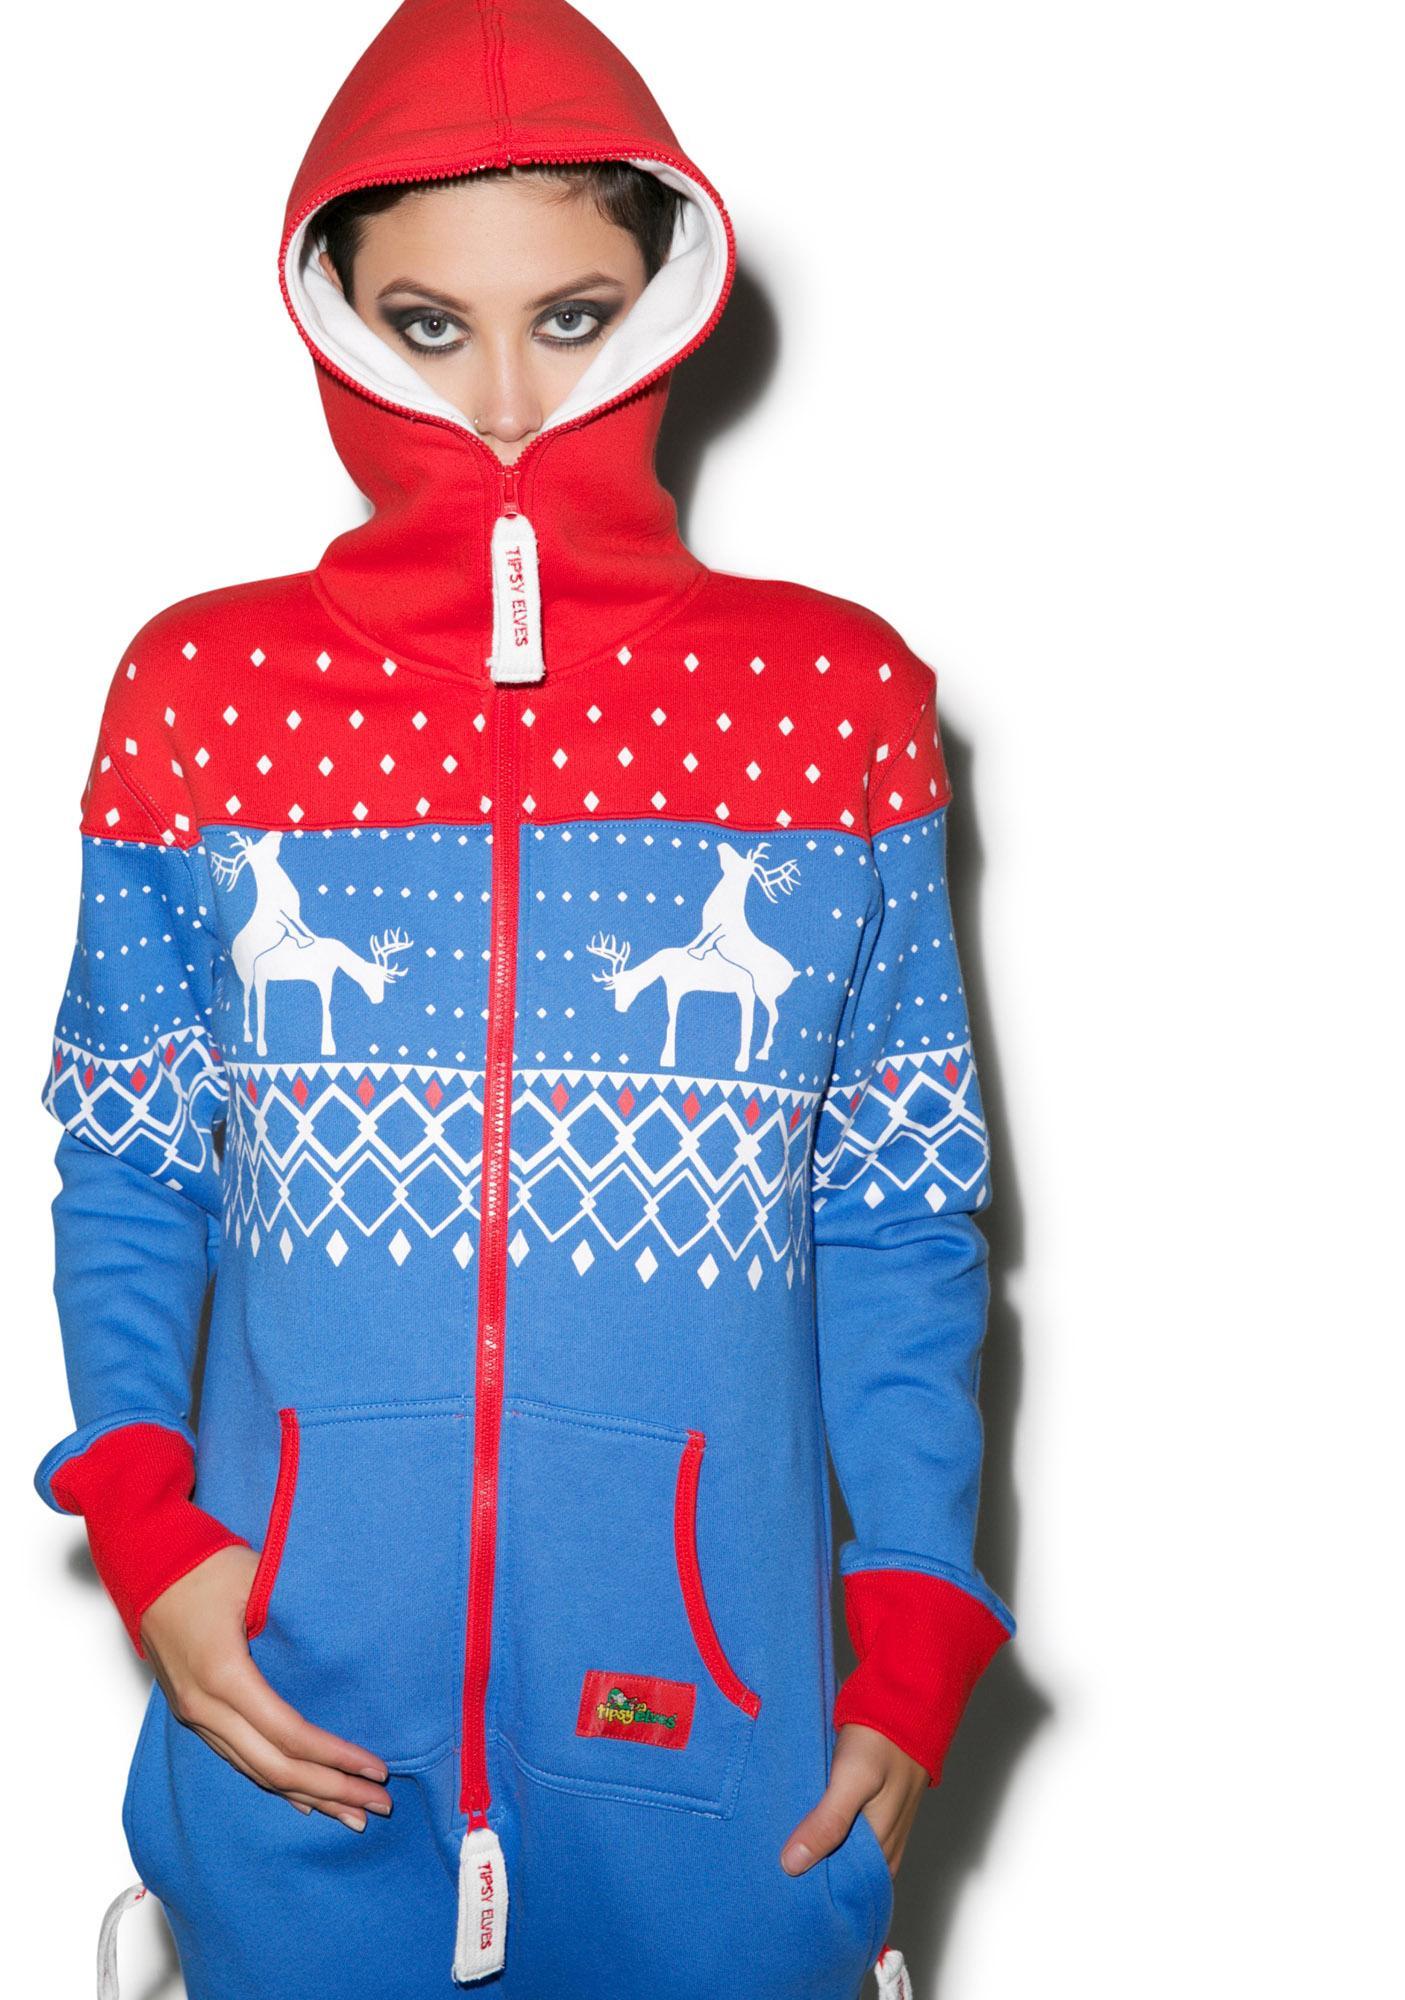 Tipsy Elves Reindeer Games Jumpsuit